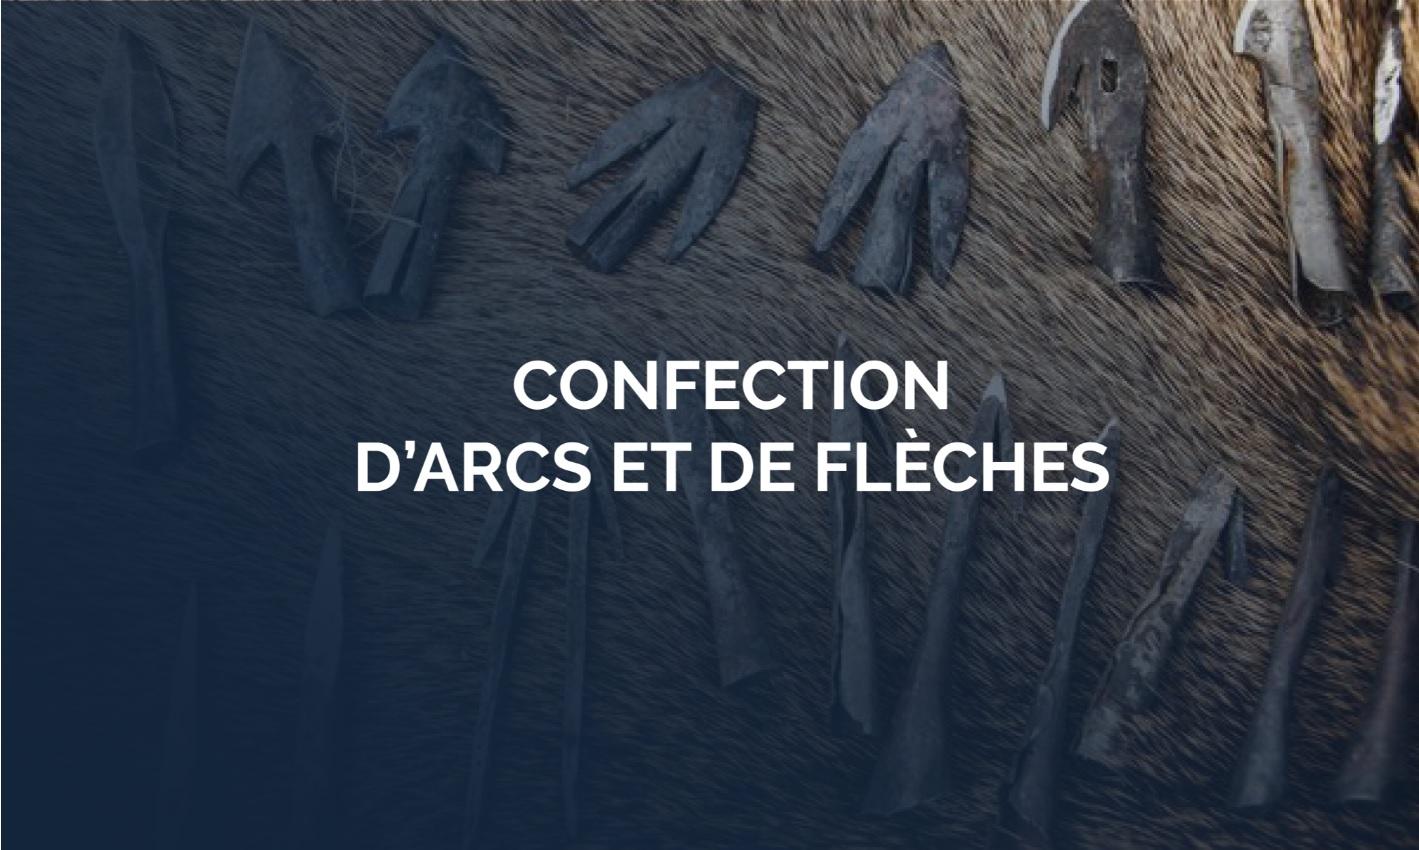 trimatrici_arcs_fleches_gaulois